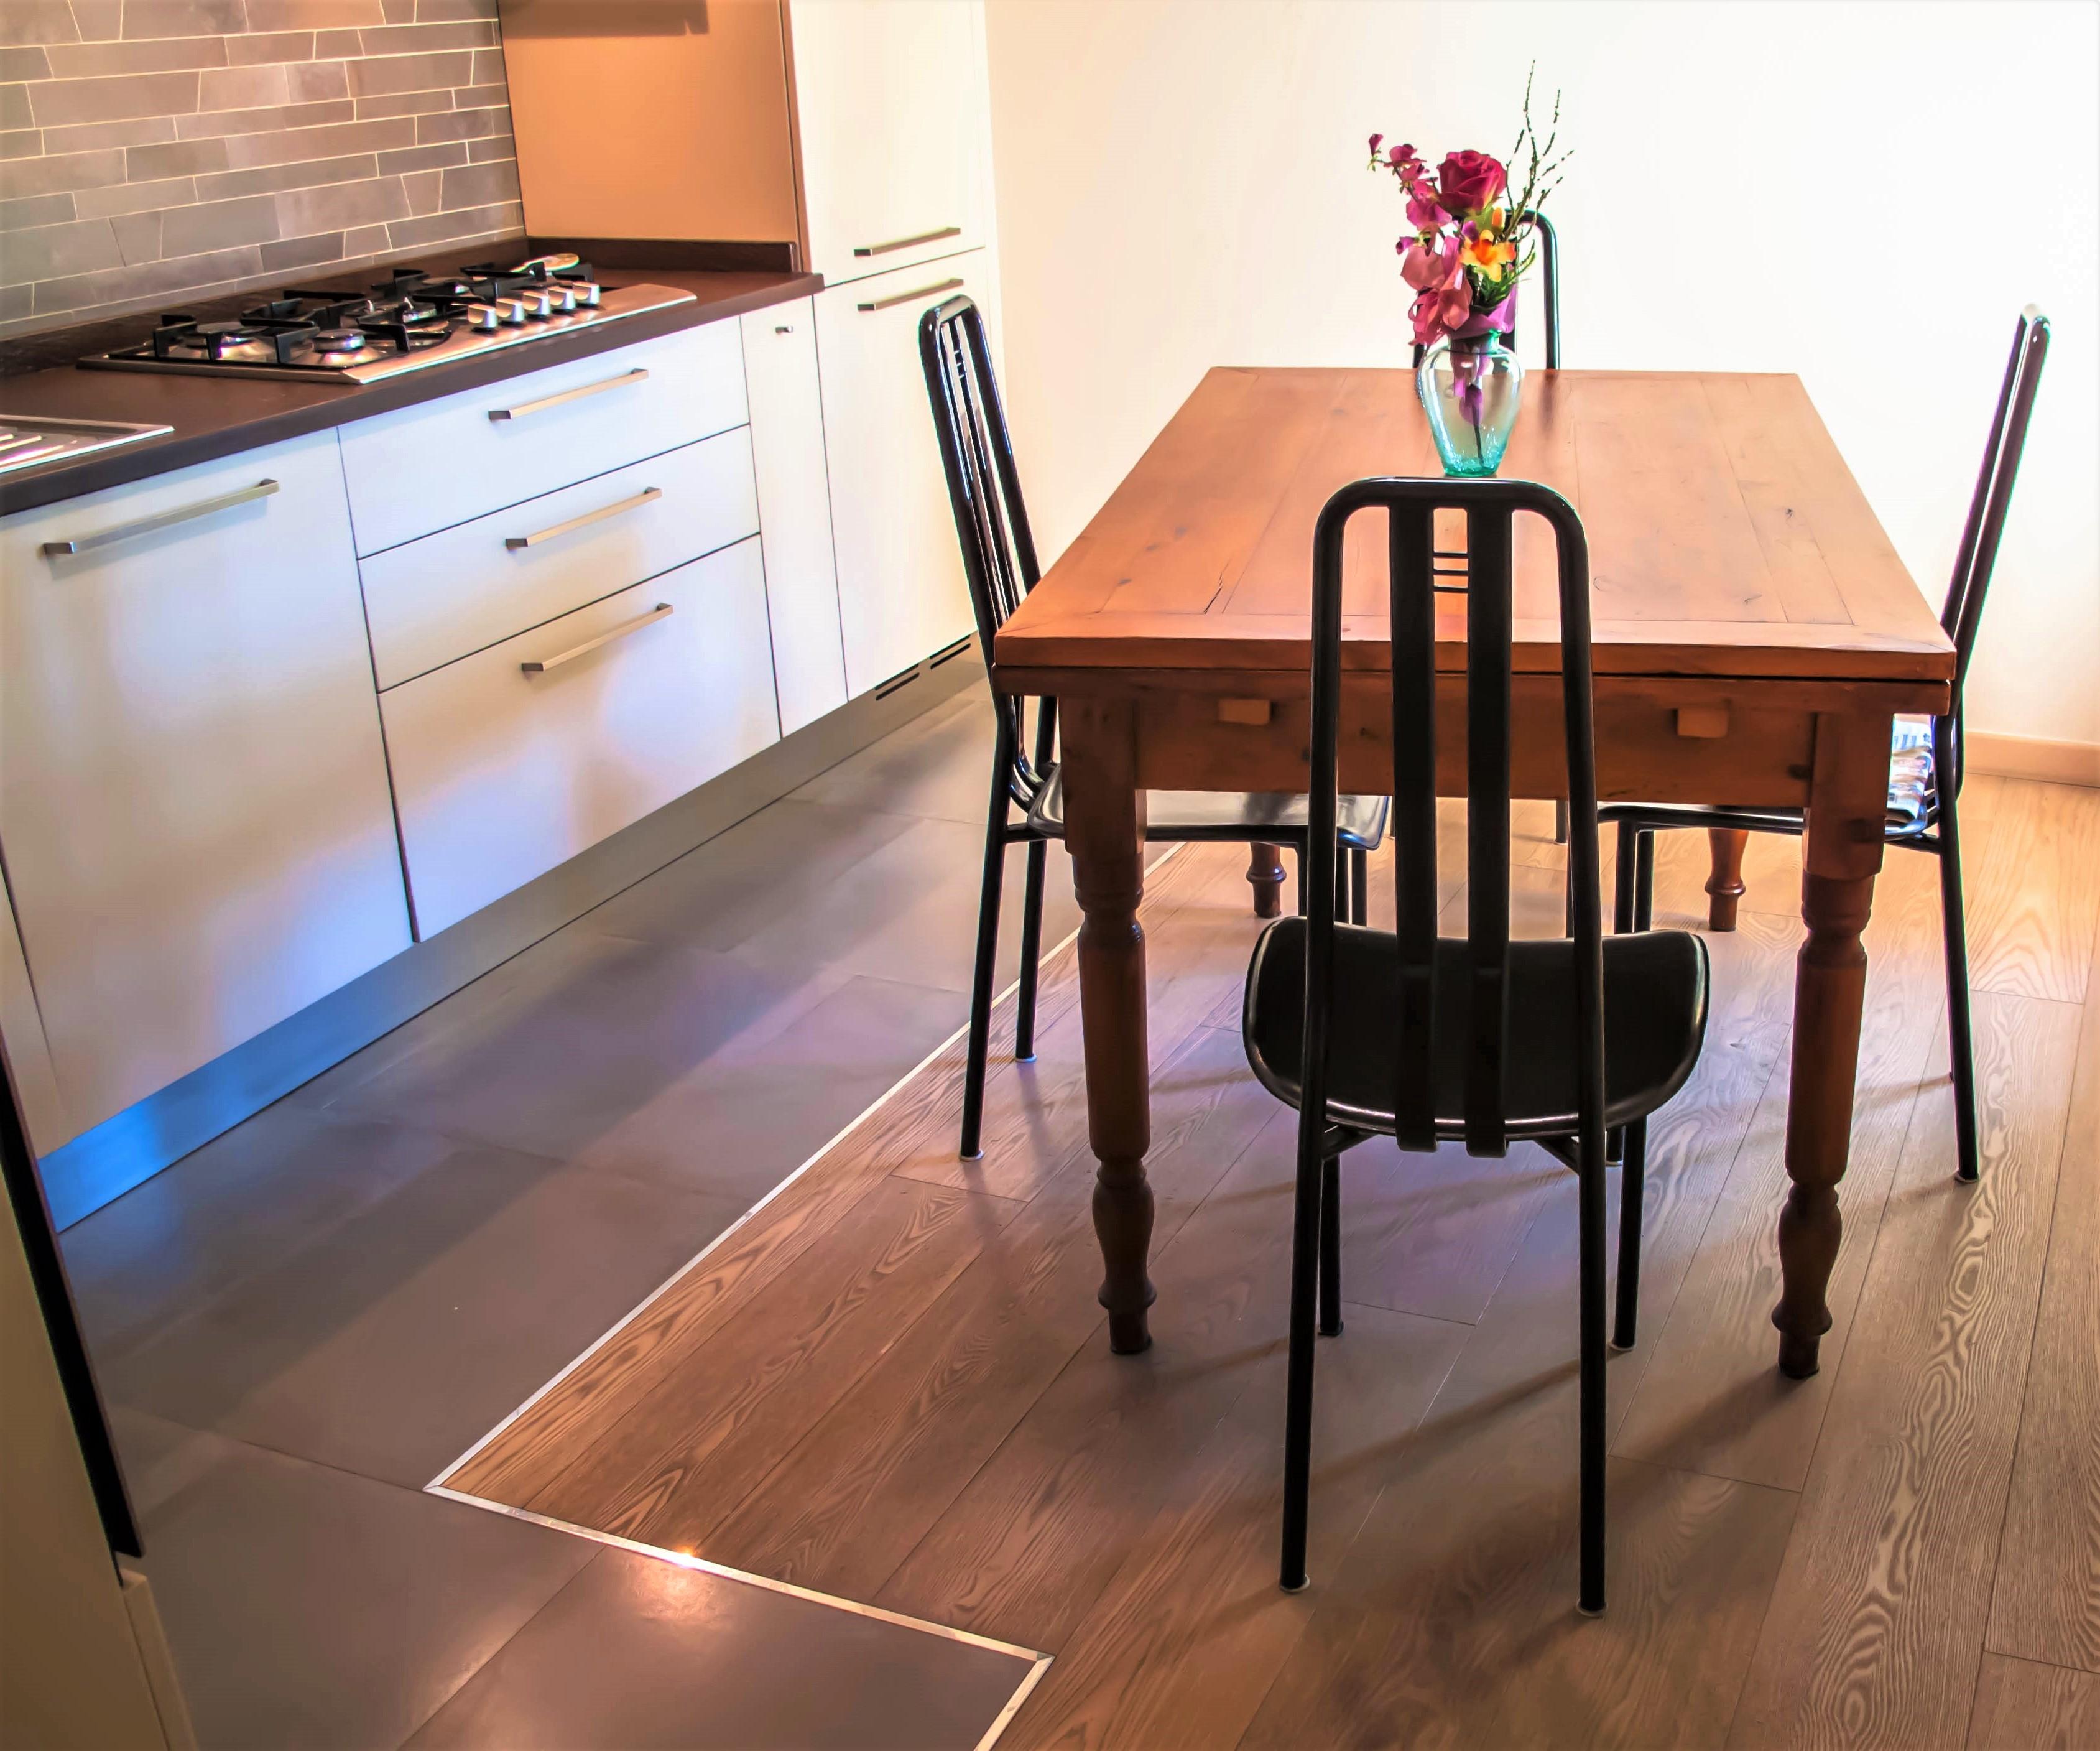 Pavimento cucina - AplusP